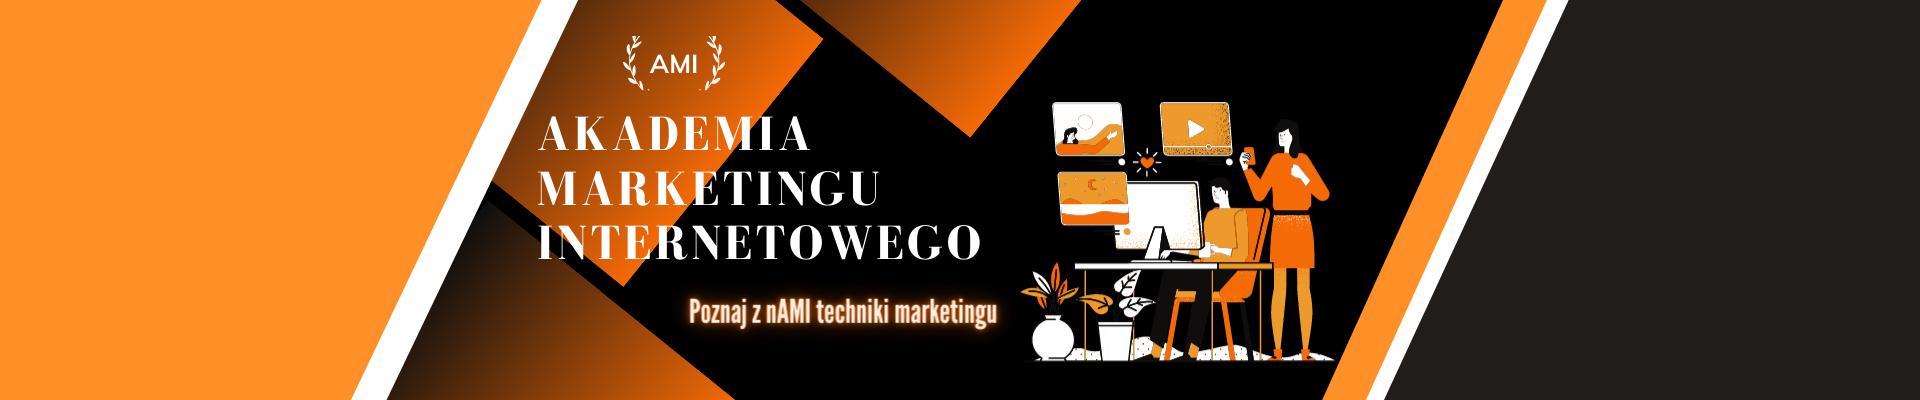 Akademia Marketingu Internetowego